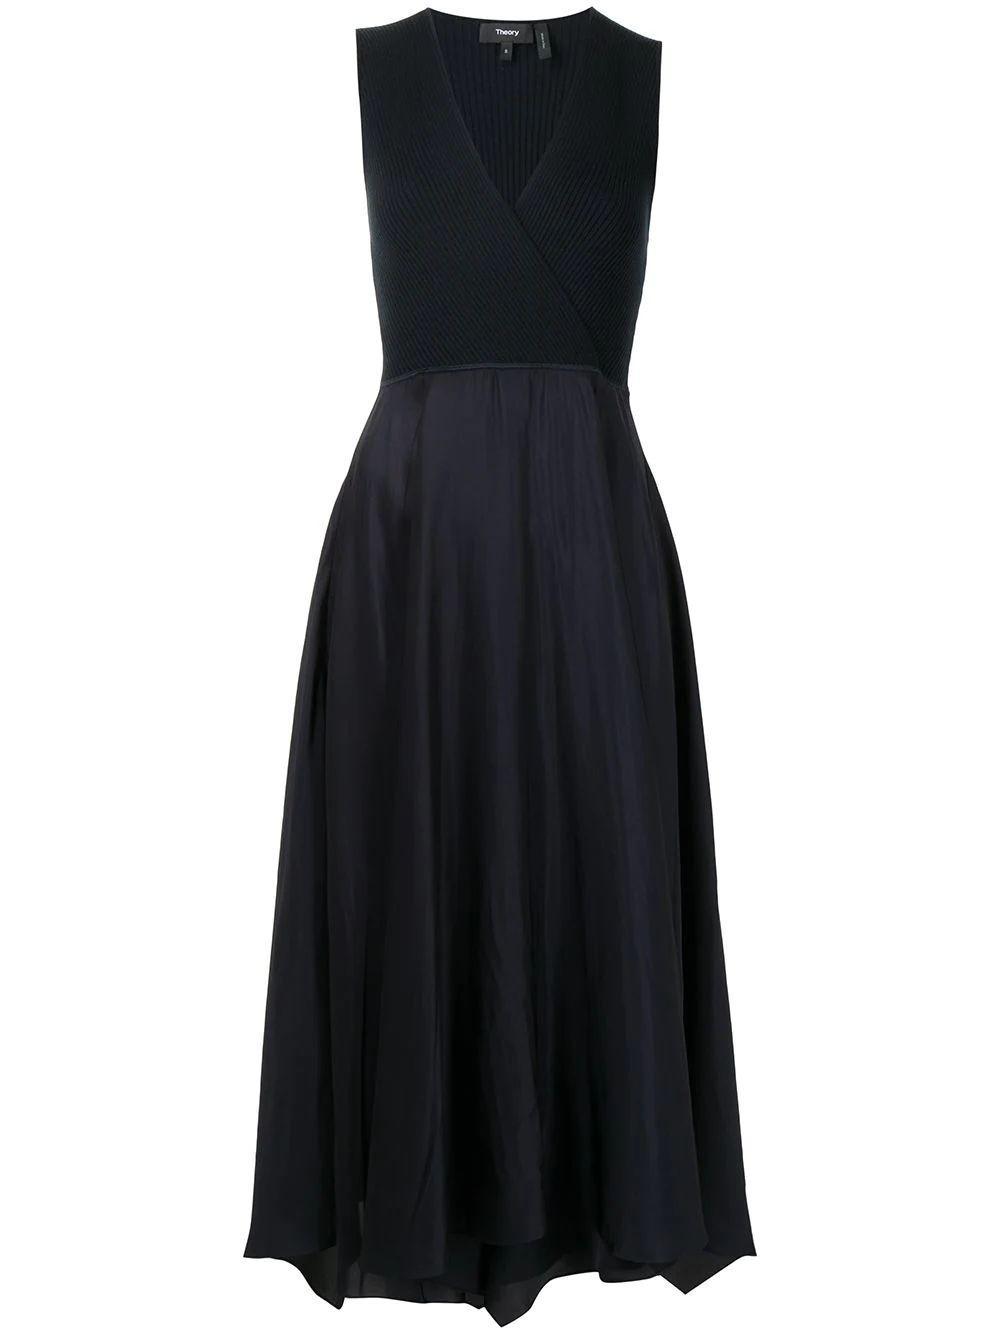 Rib Knit Bodice Dress